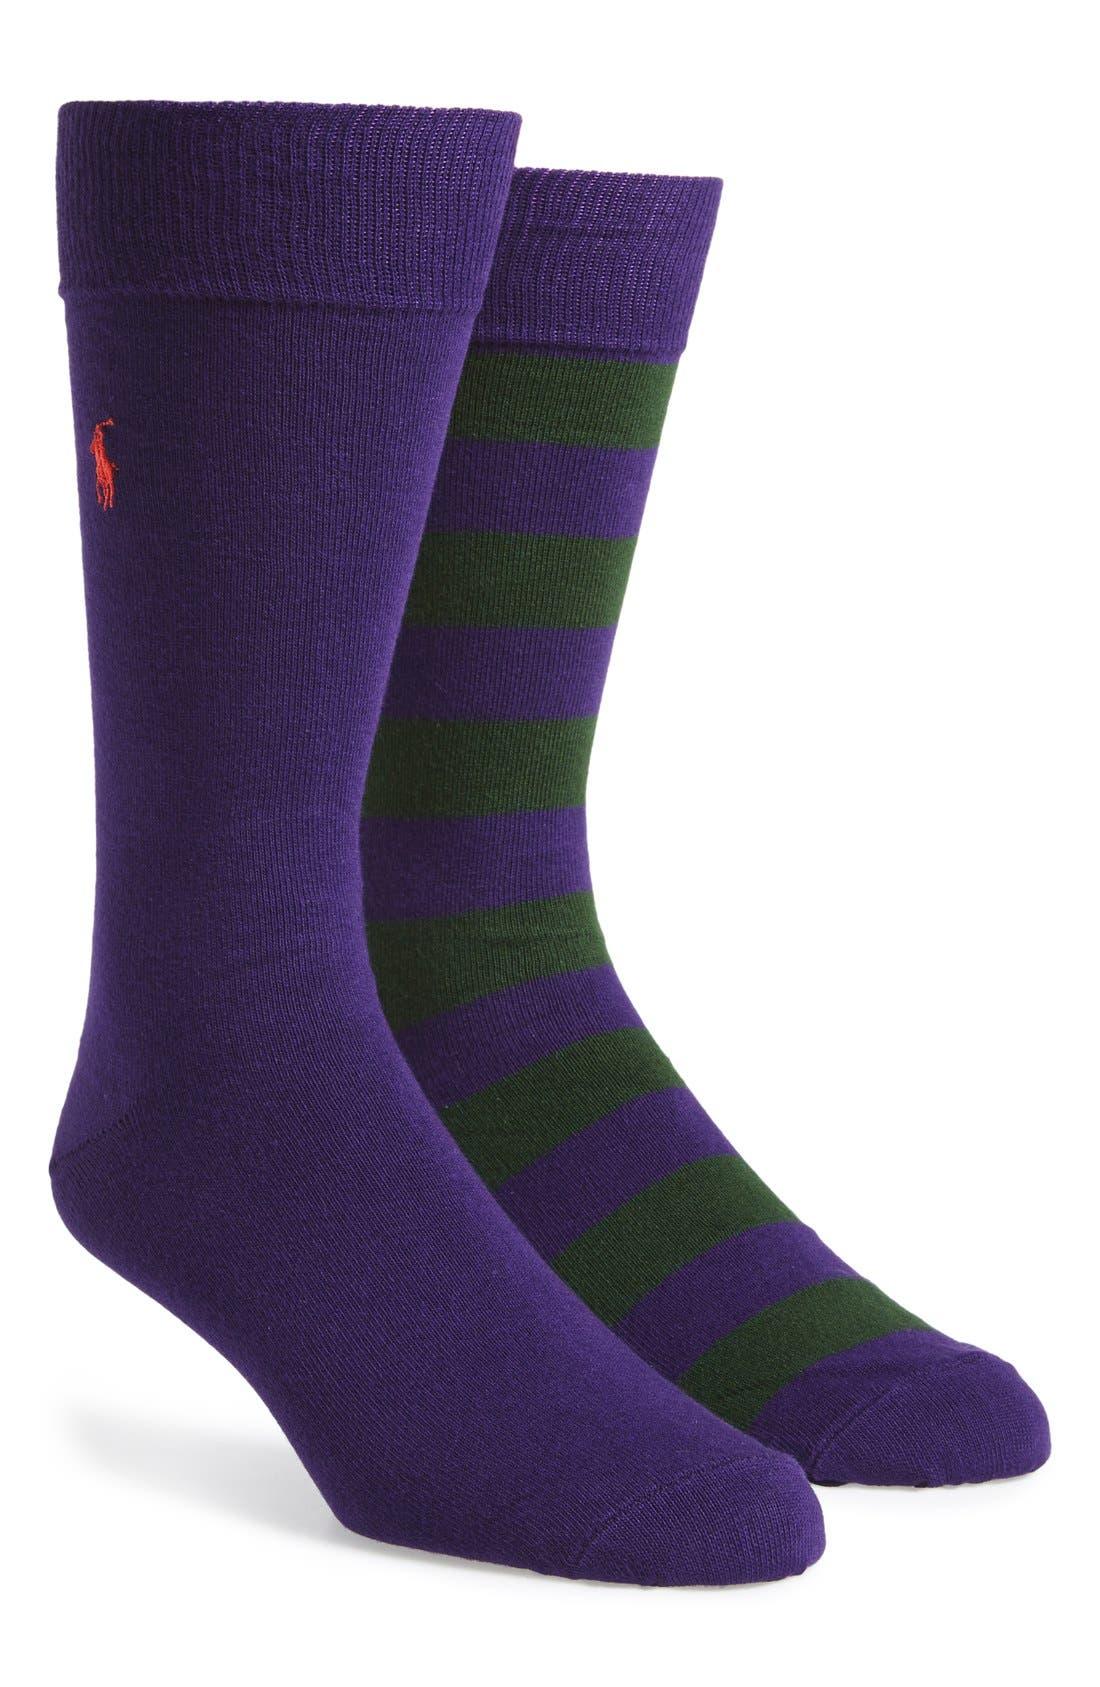 Cotton Blend Socks,                             Main thumbnail 15, color,